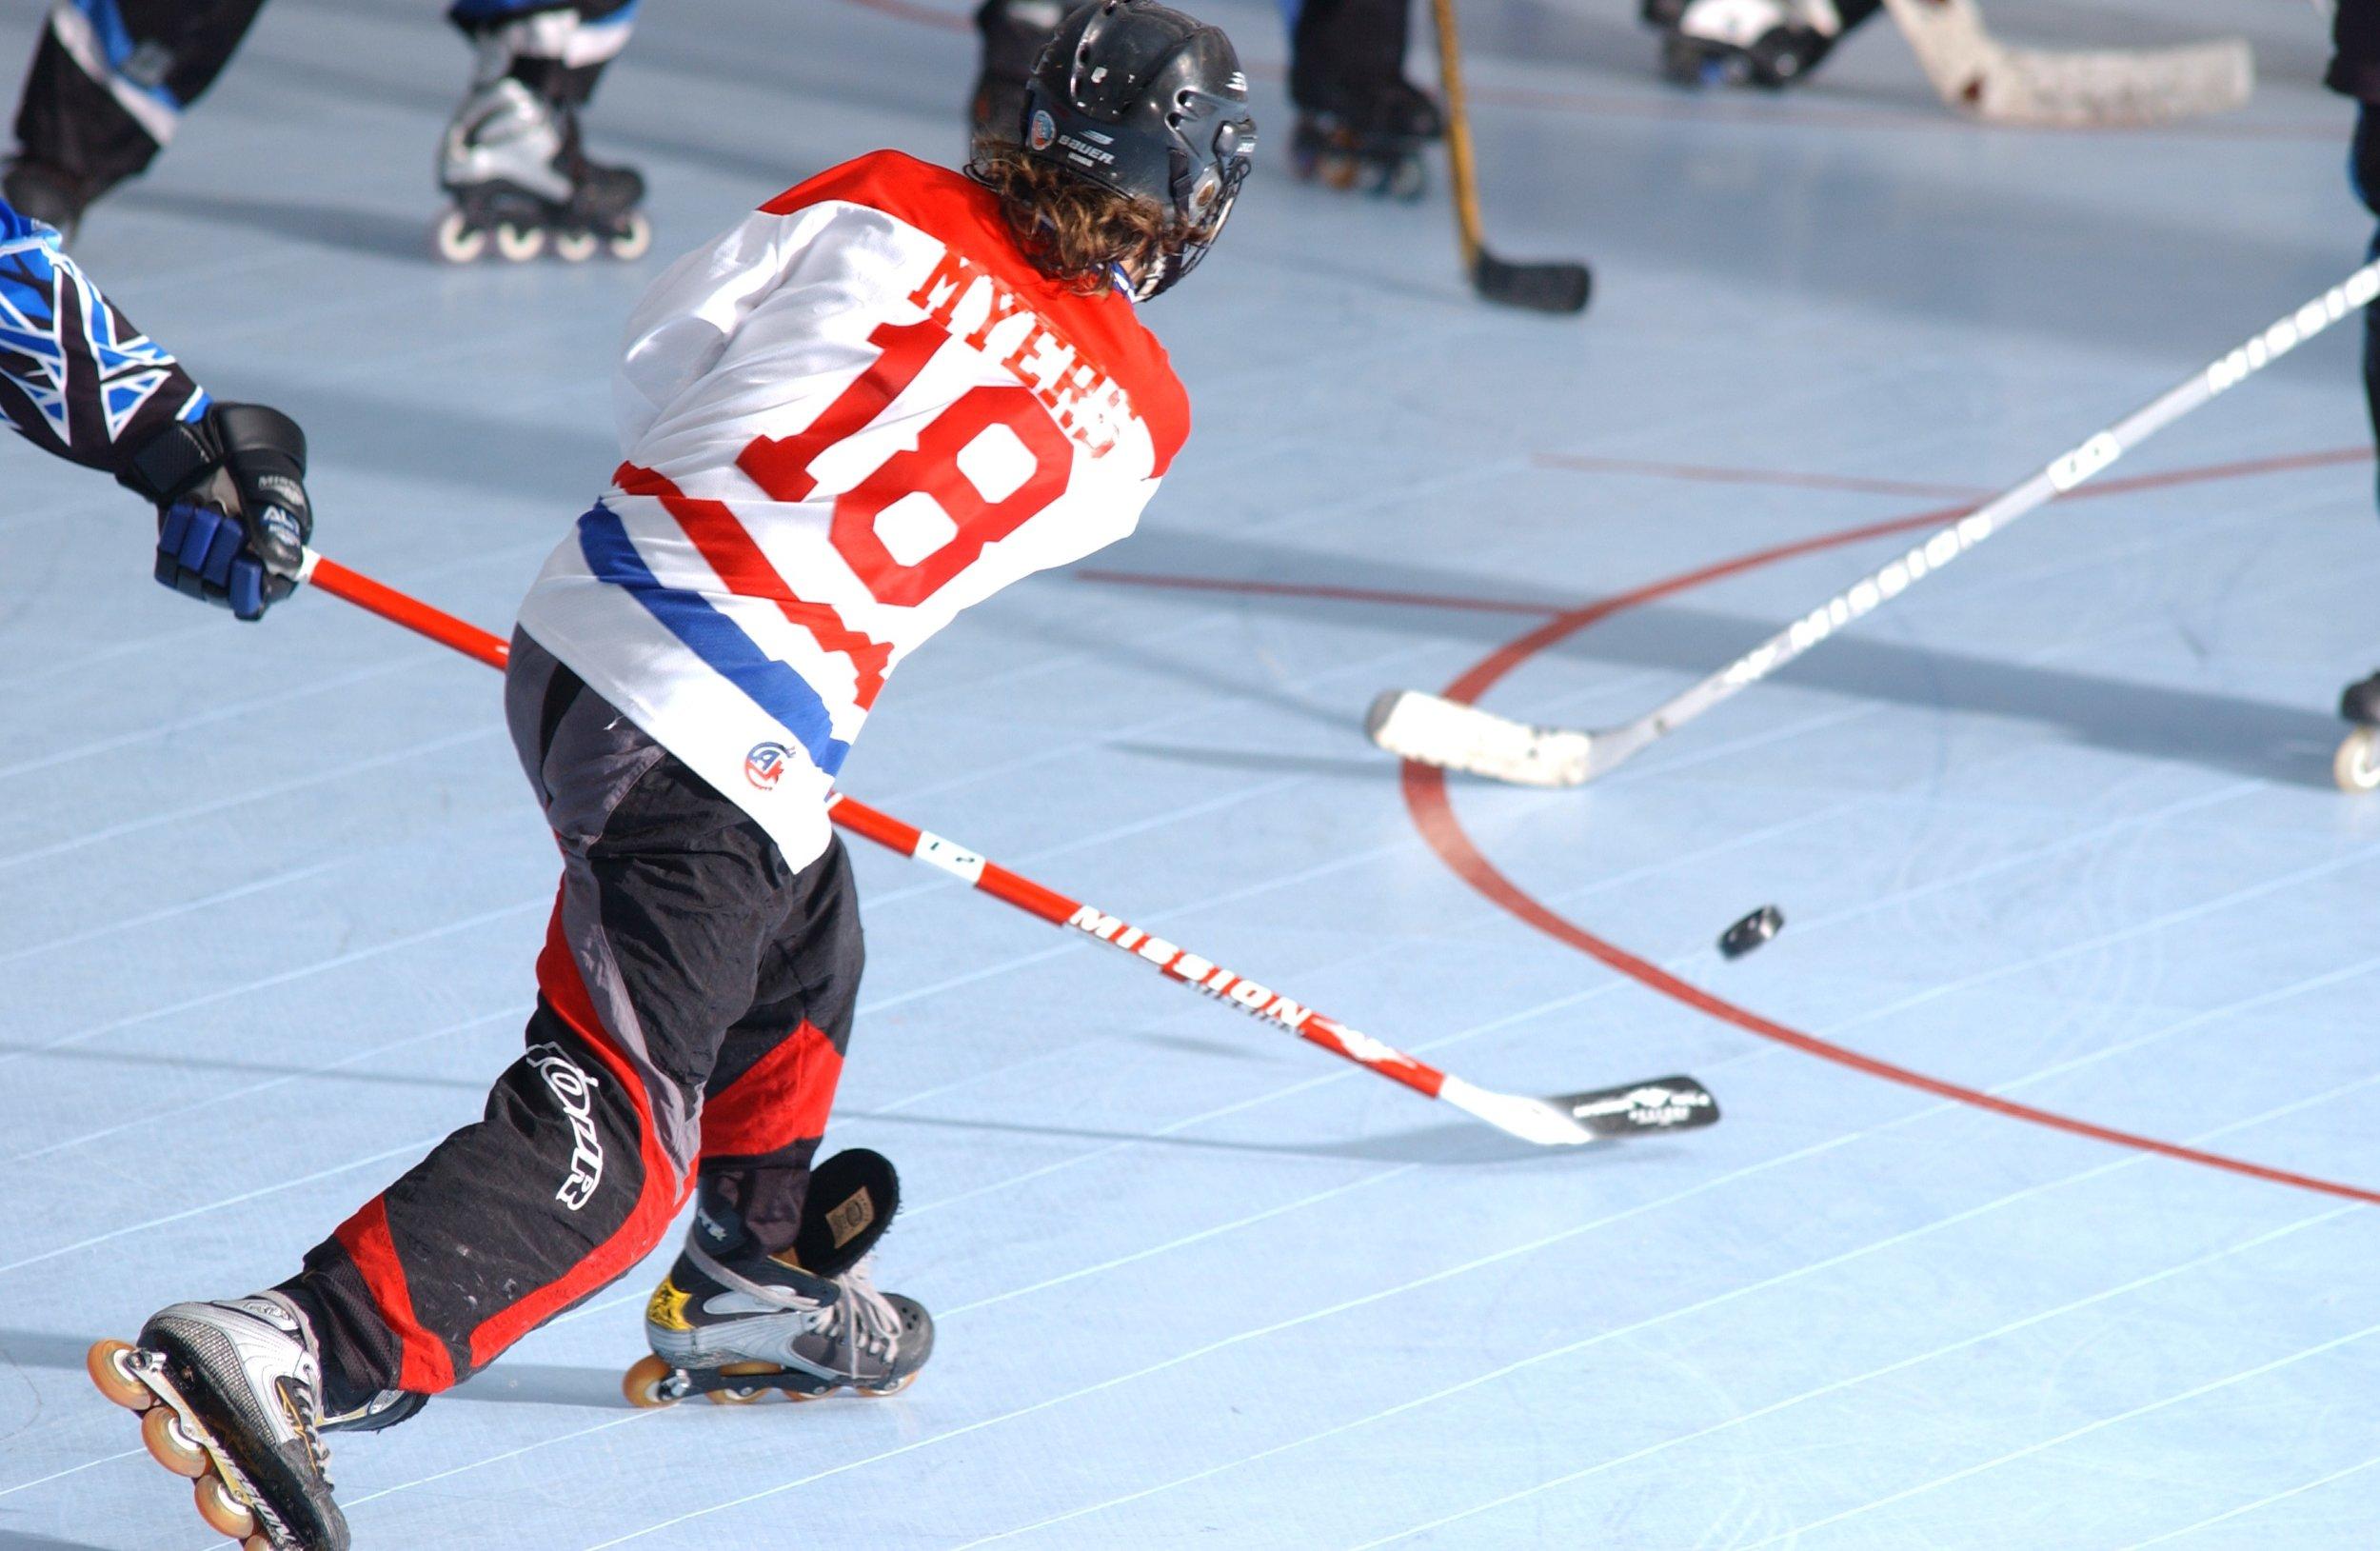 rollerhockey.jpg